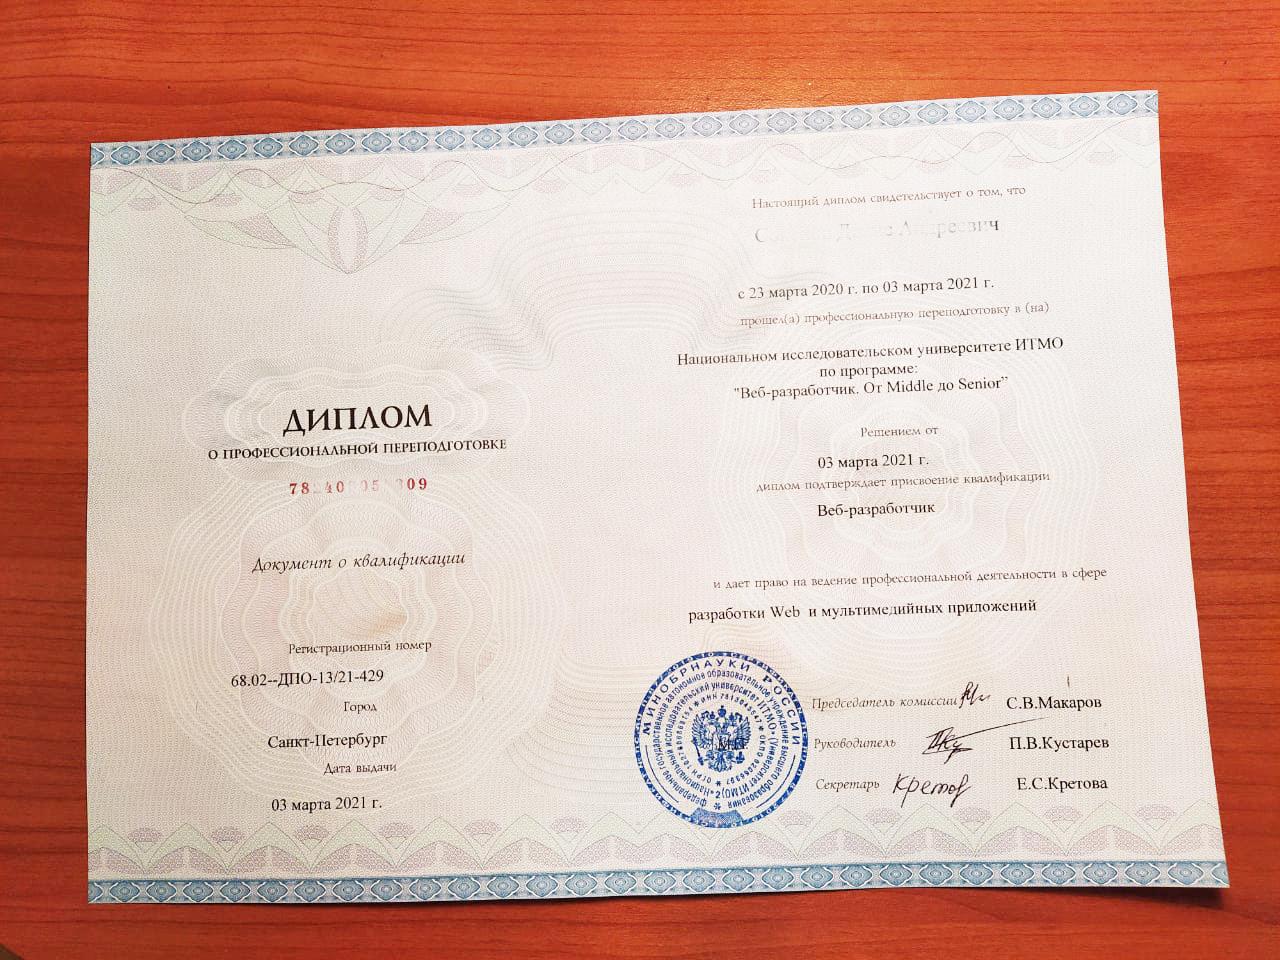 https://design.itmo.ru/wp-content/uploads/2018/02/Diplom_s_kvalific.jpg